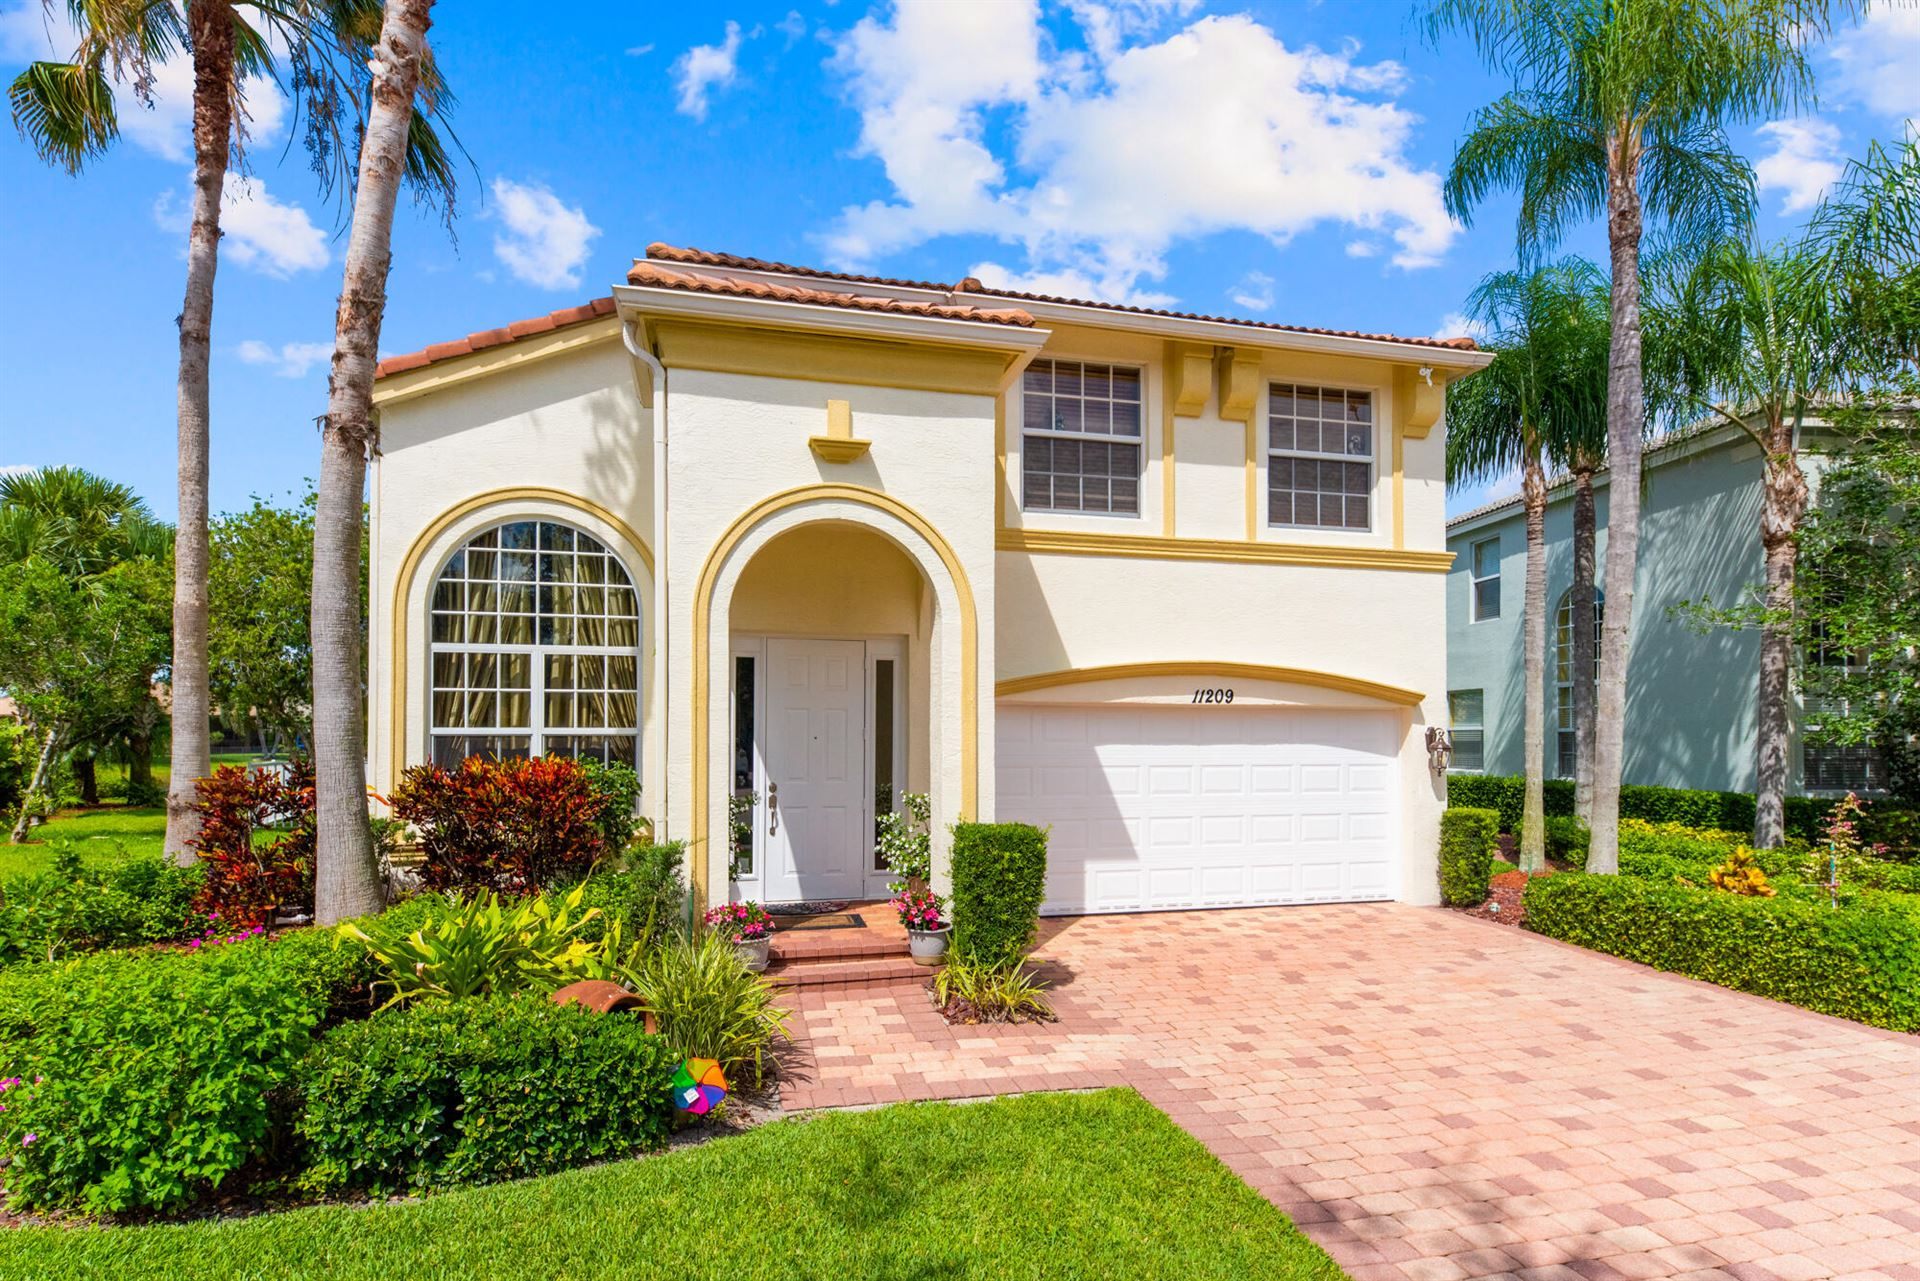 11209 SW Springtree Terrace, Port Saint Lucie, FL 34987 - MLS#: RX-10723053